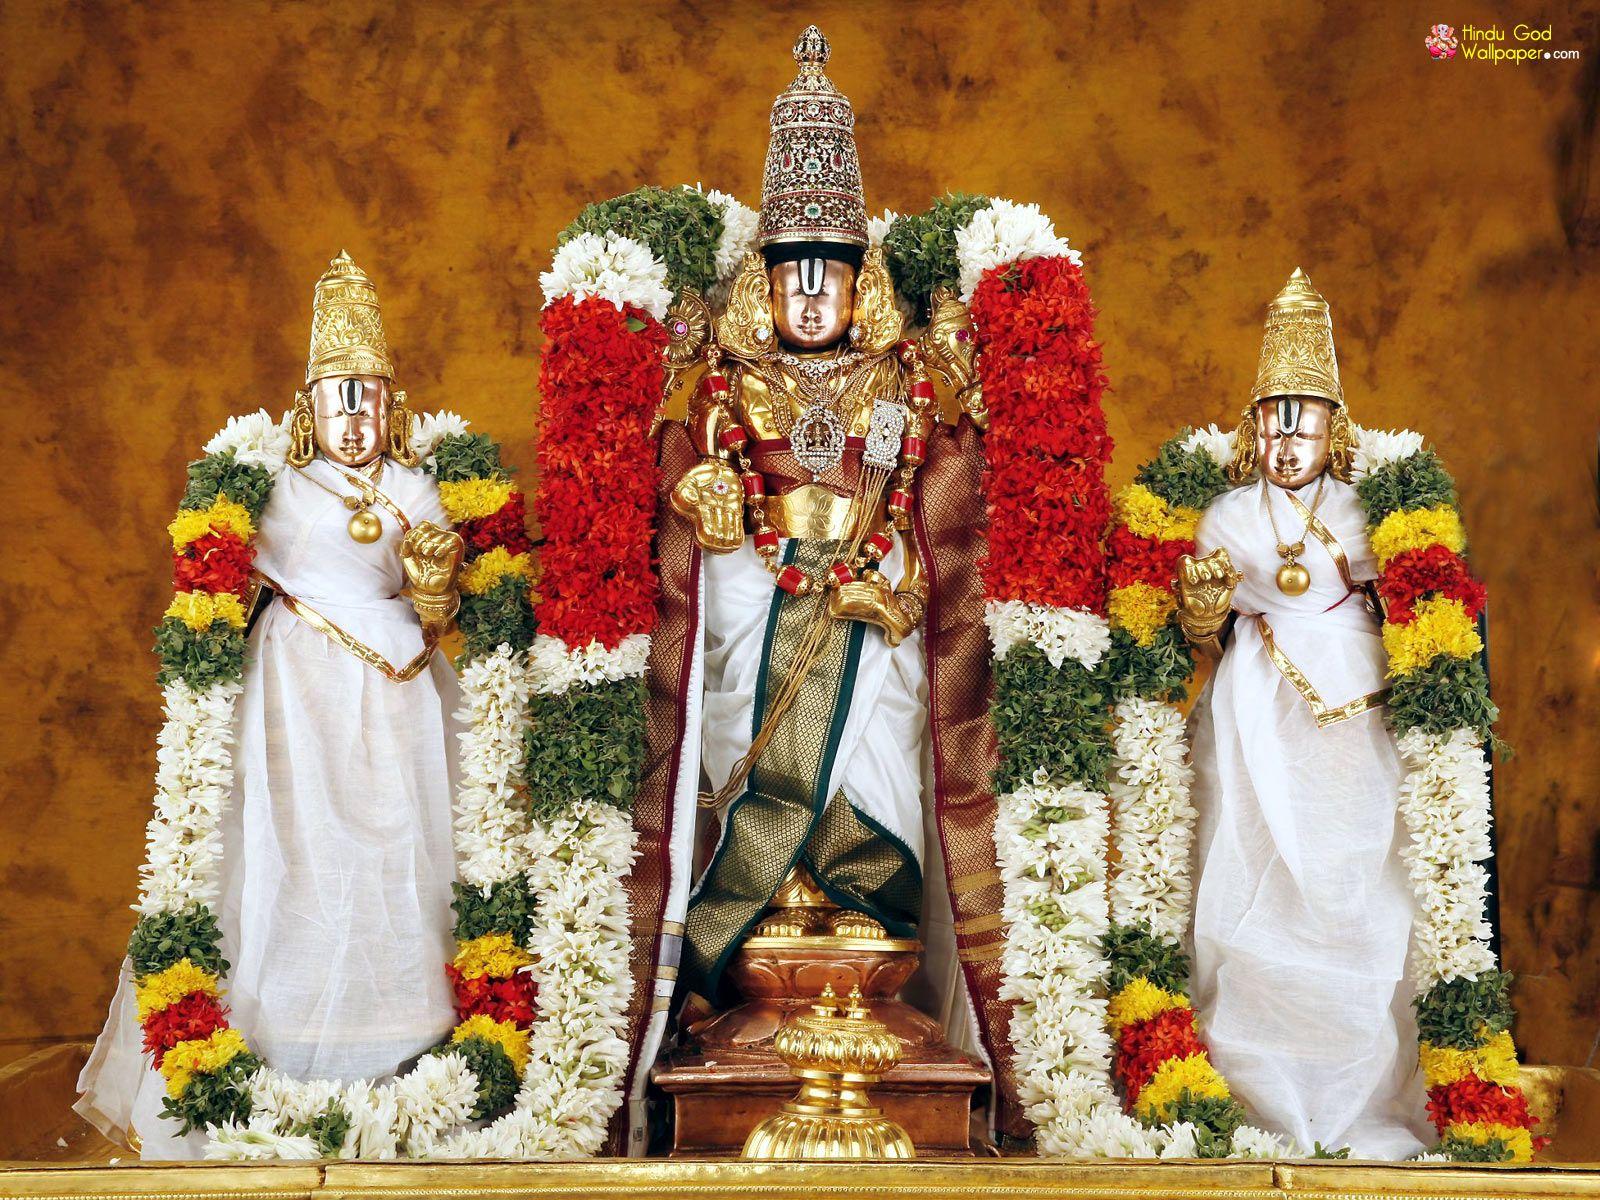 Tirupati Tirumala Lord Venkateswara Swamy Wallpapers Download